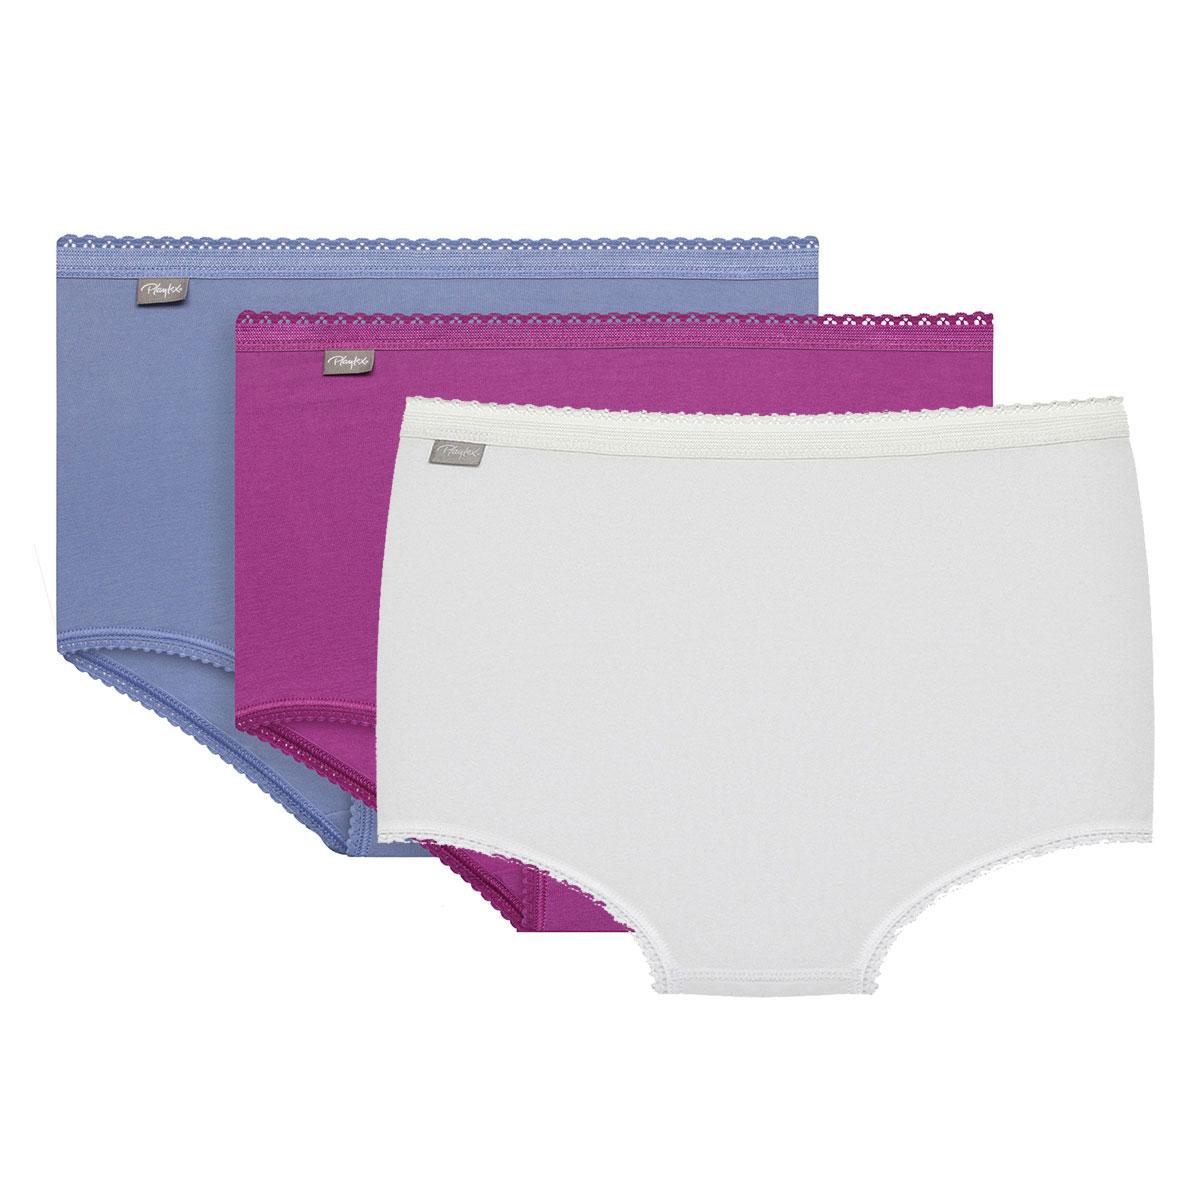 3 Pack Midi briefs : white, purple and blue - Cotton Stretch-PLAYTEX